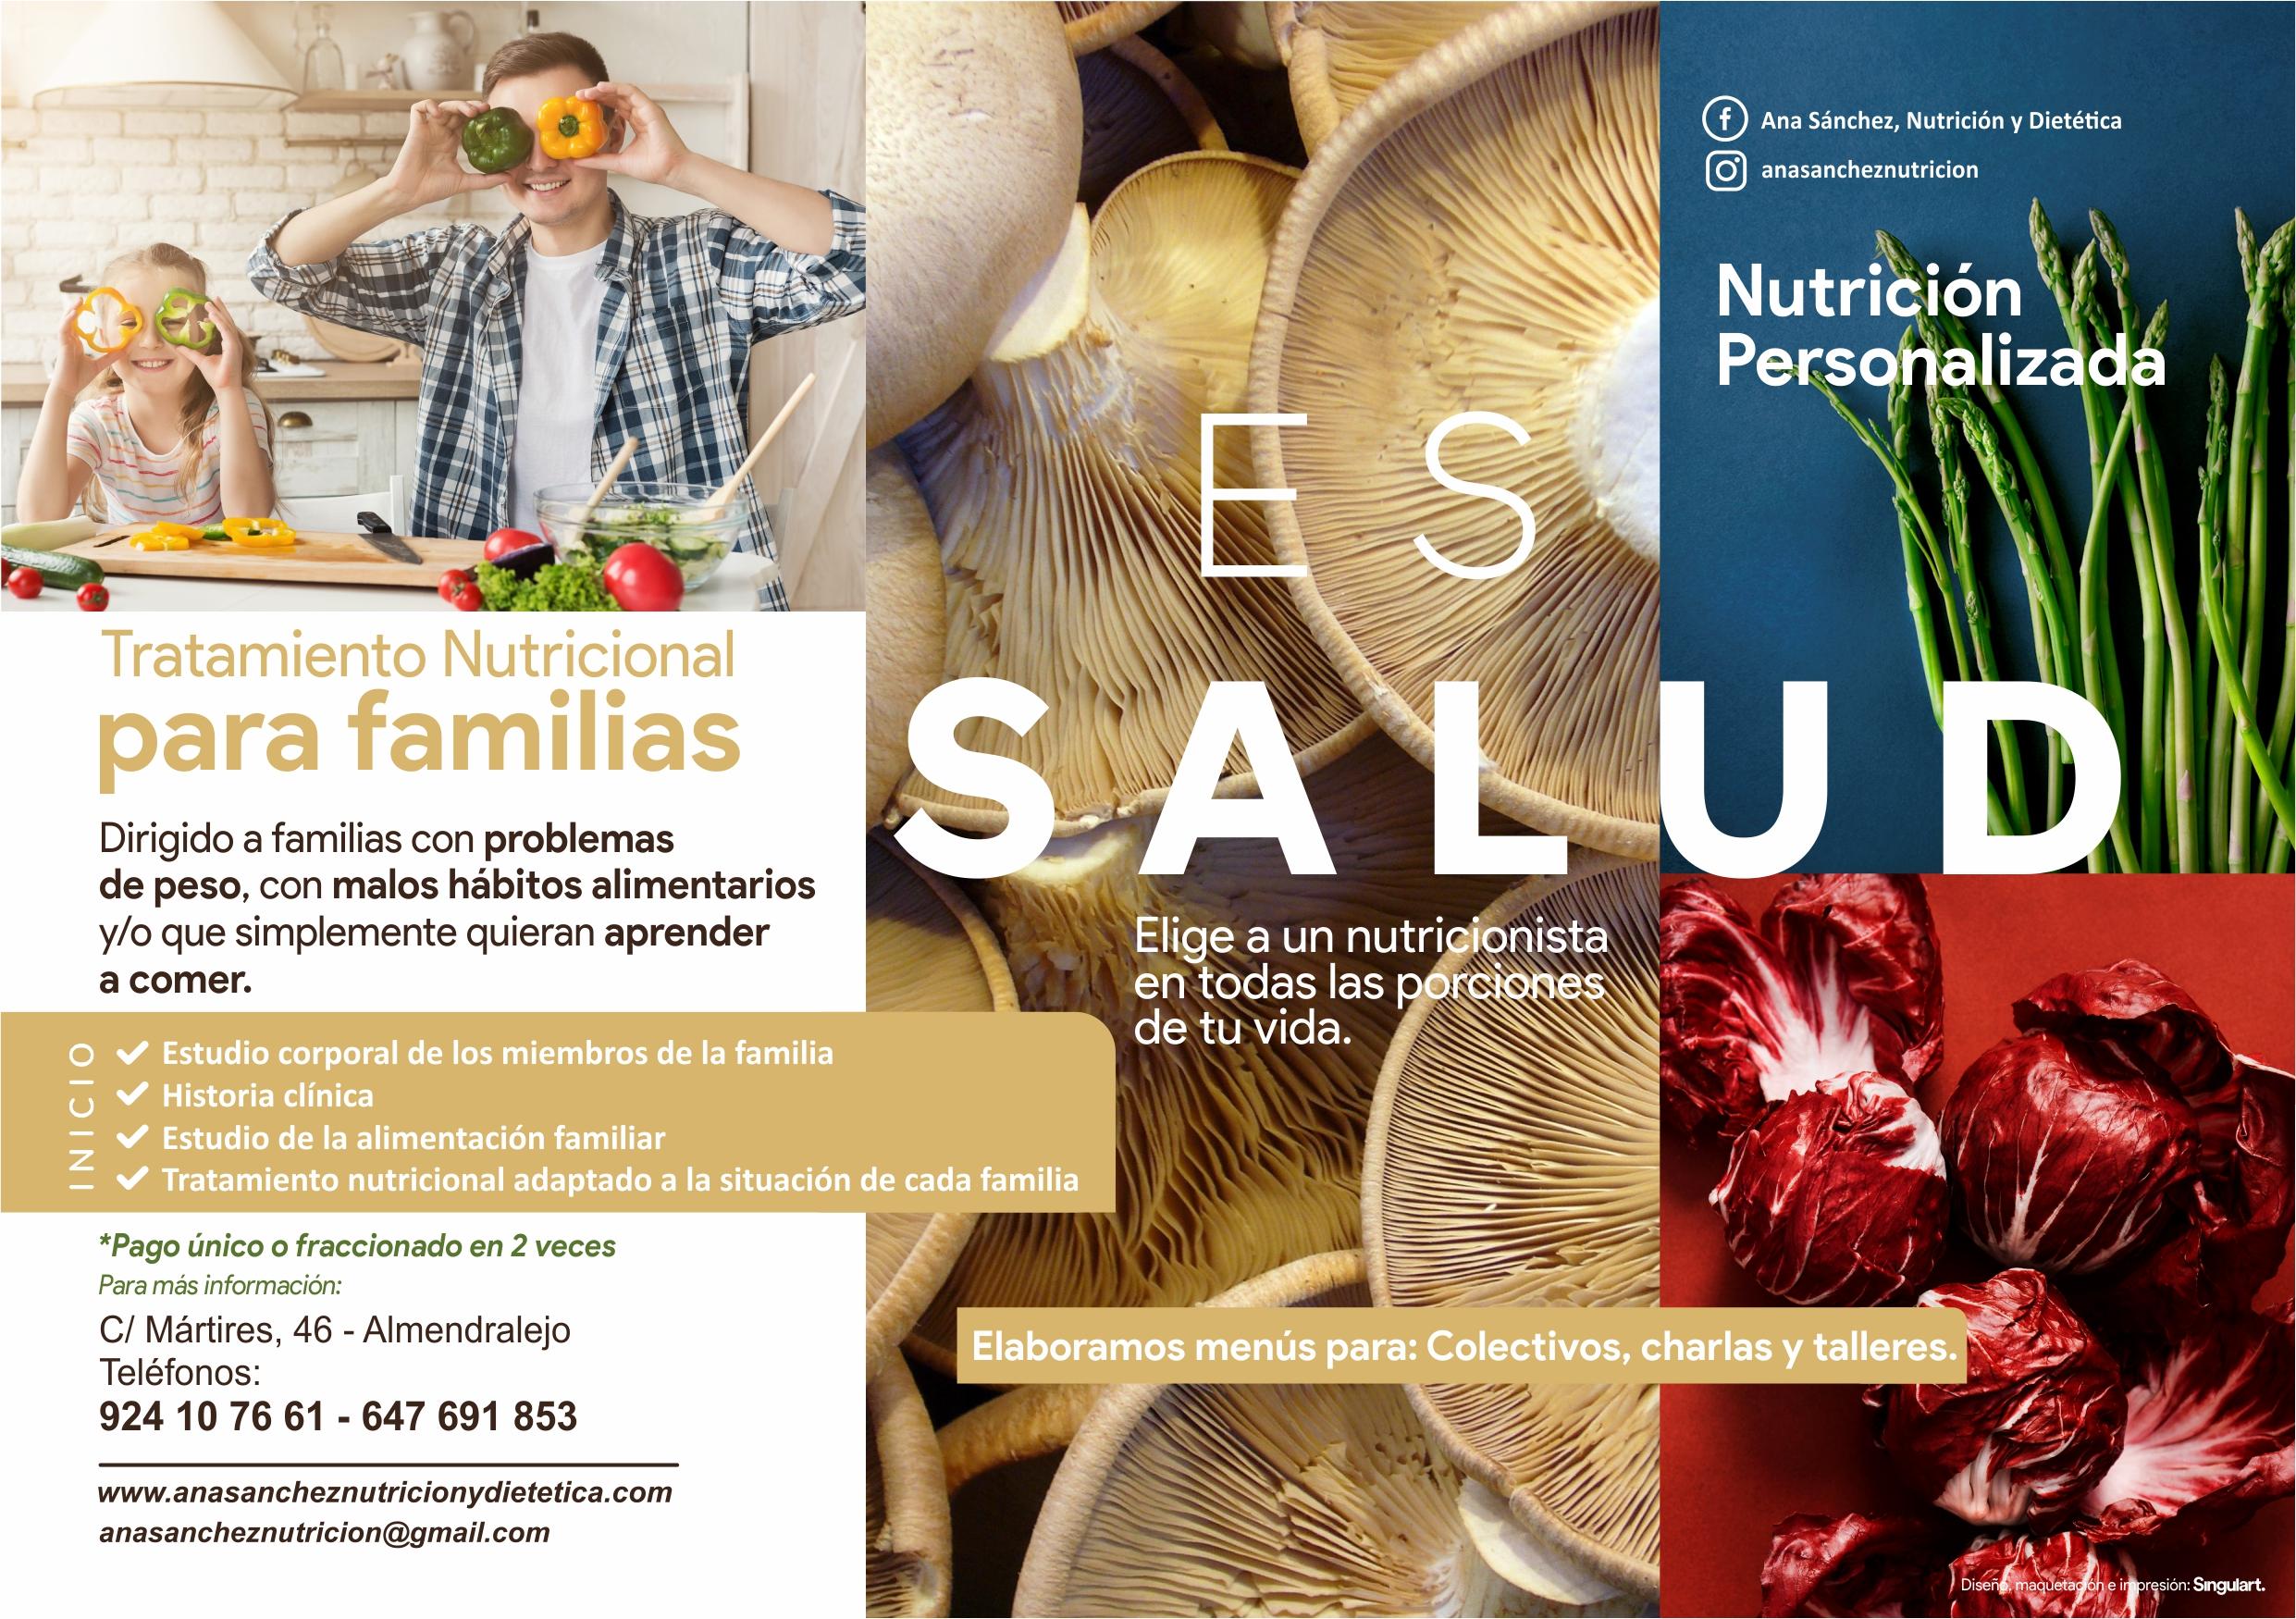 Tratamiento Nutricional para familias Ana Sánchez